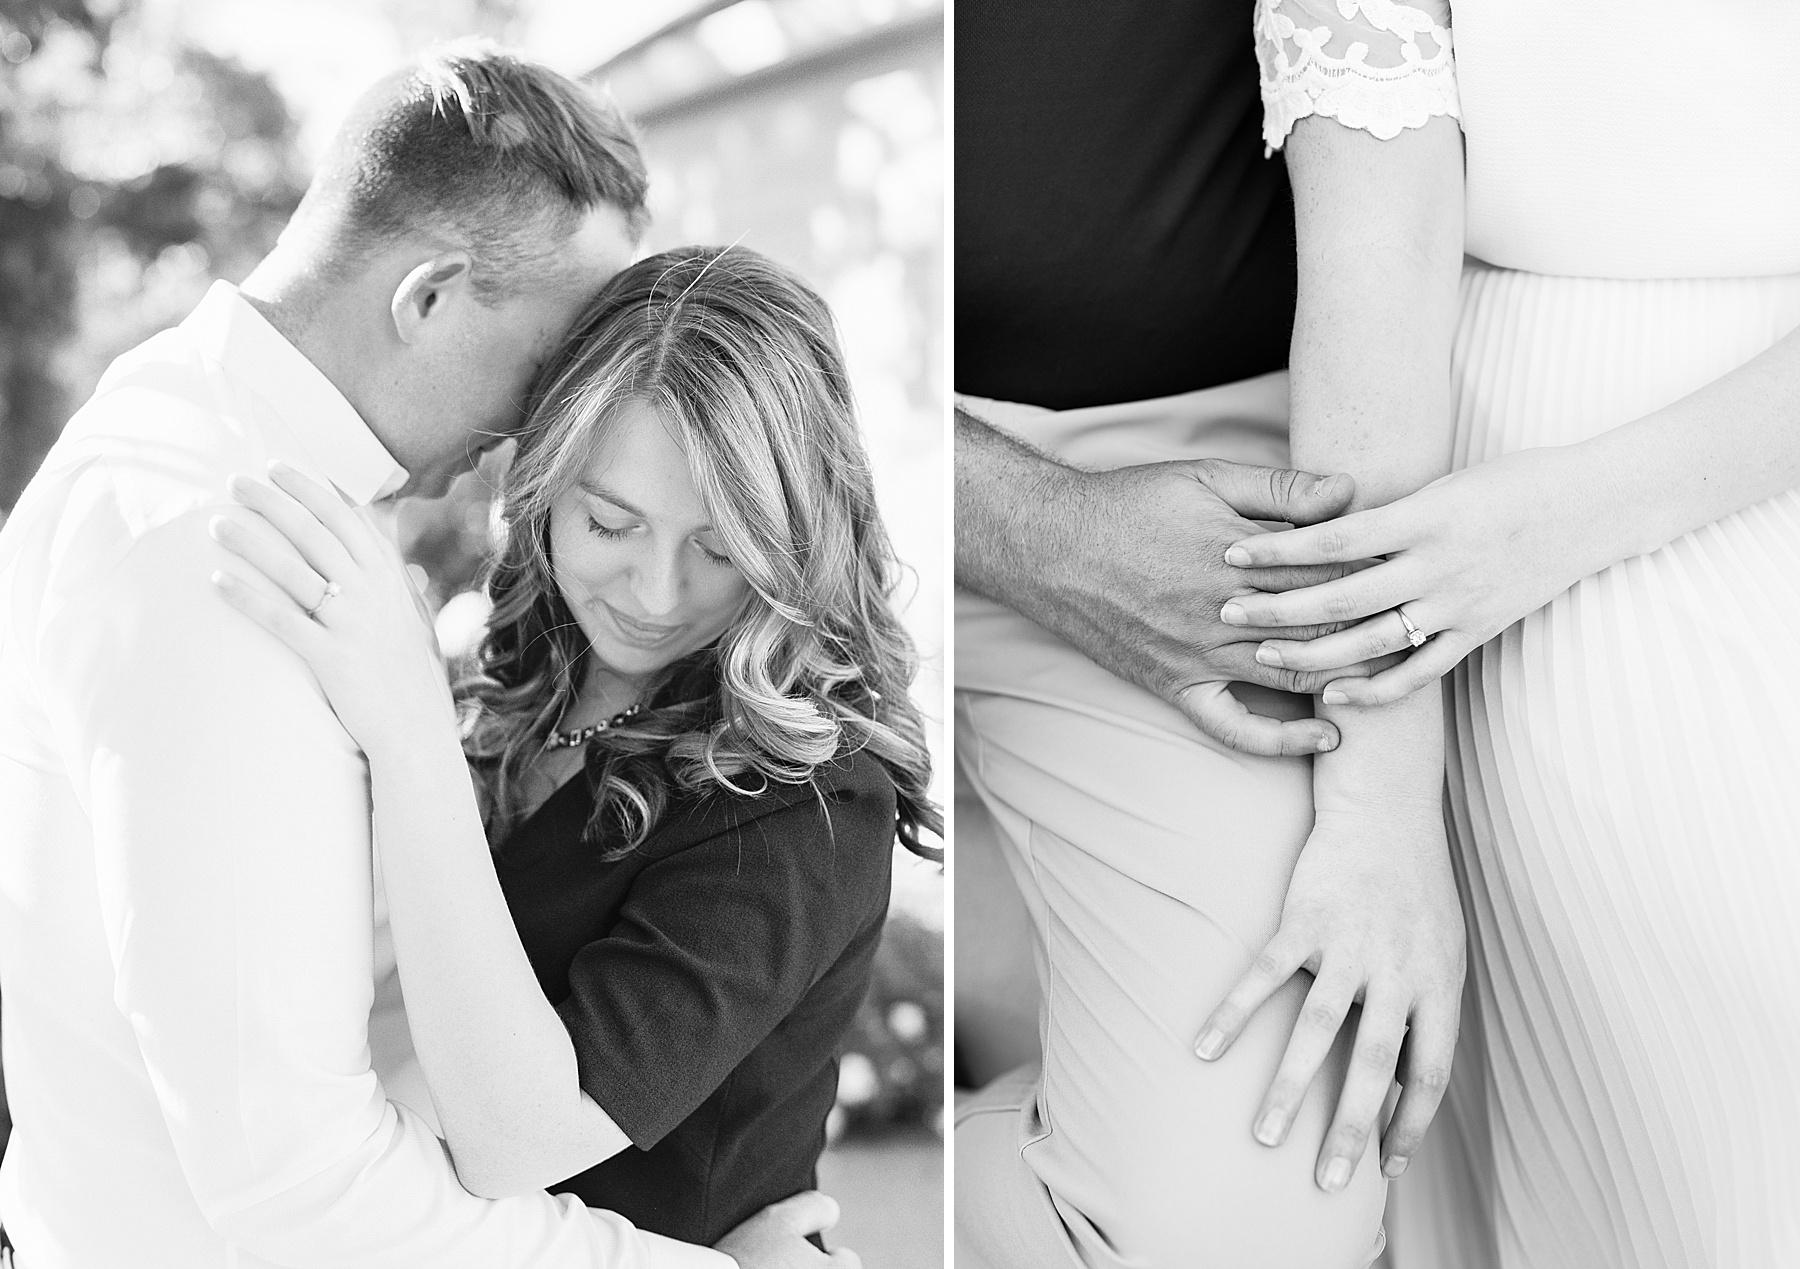 Scribner Bend Winery Engagement Session - Courtney and Steven - Ashley Baumgartner - Sribner Bend Wedding Photographer - Sacramento Wedding Photographer_0016.jpg